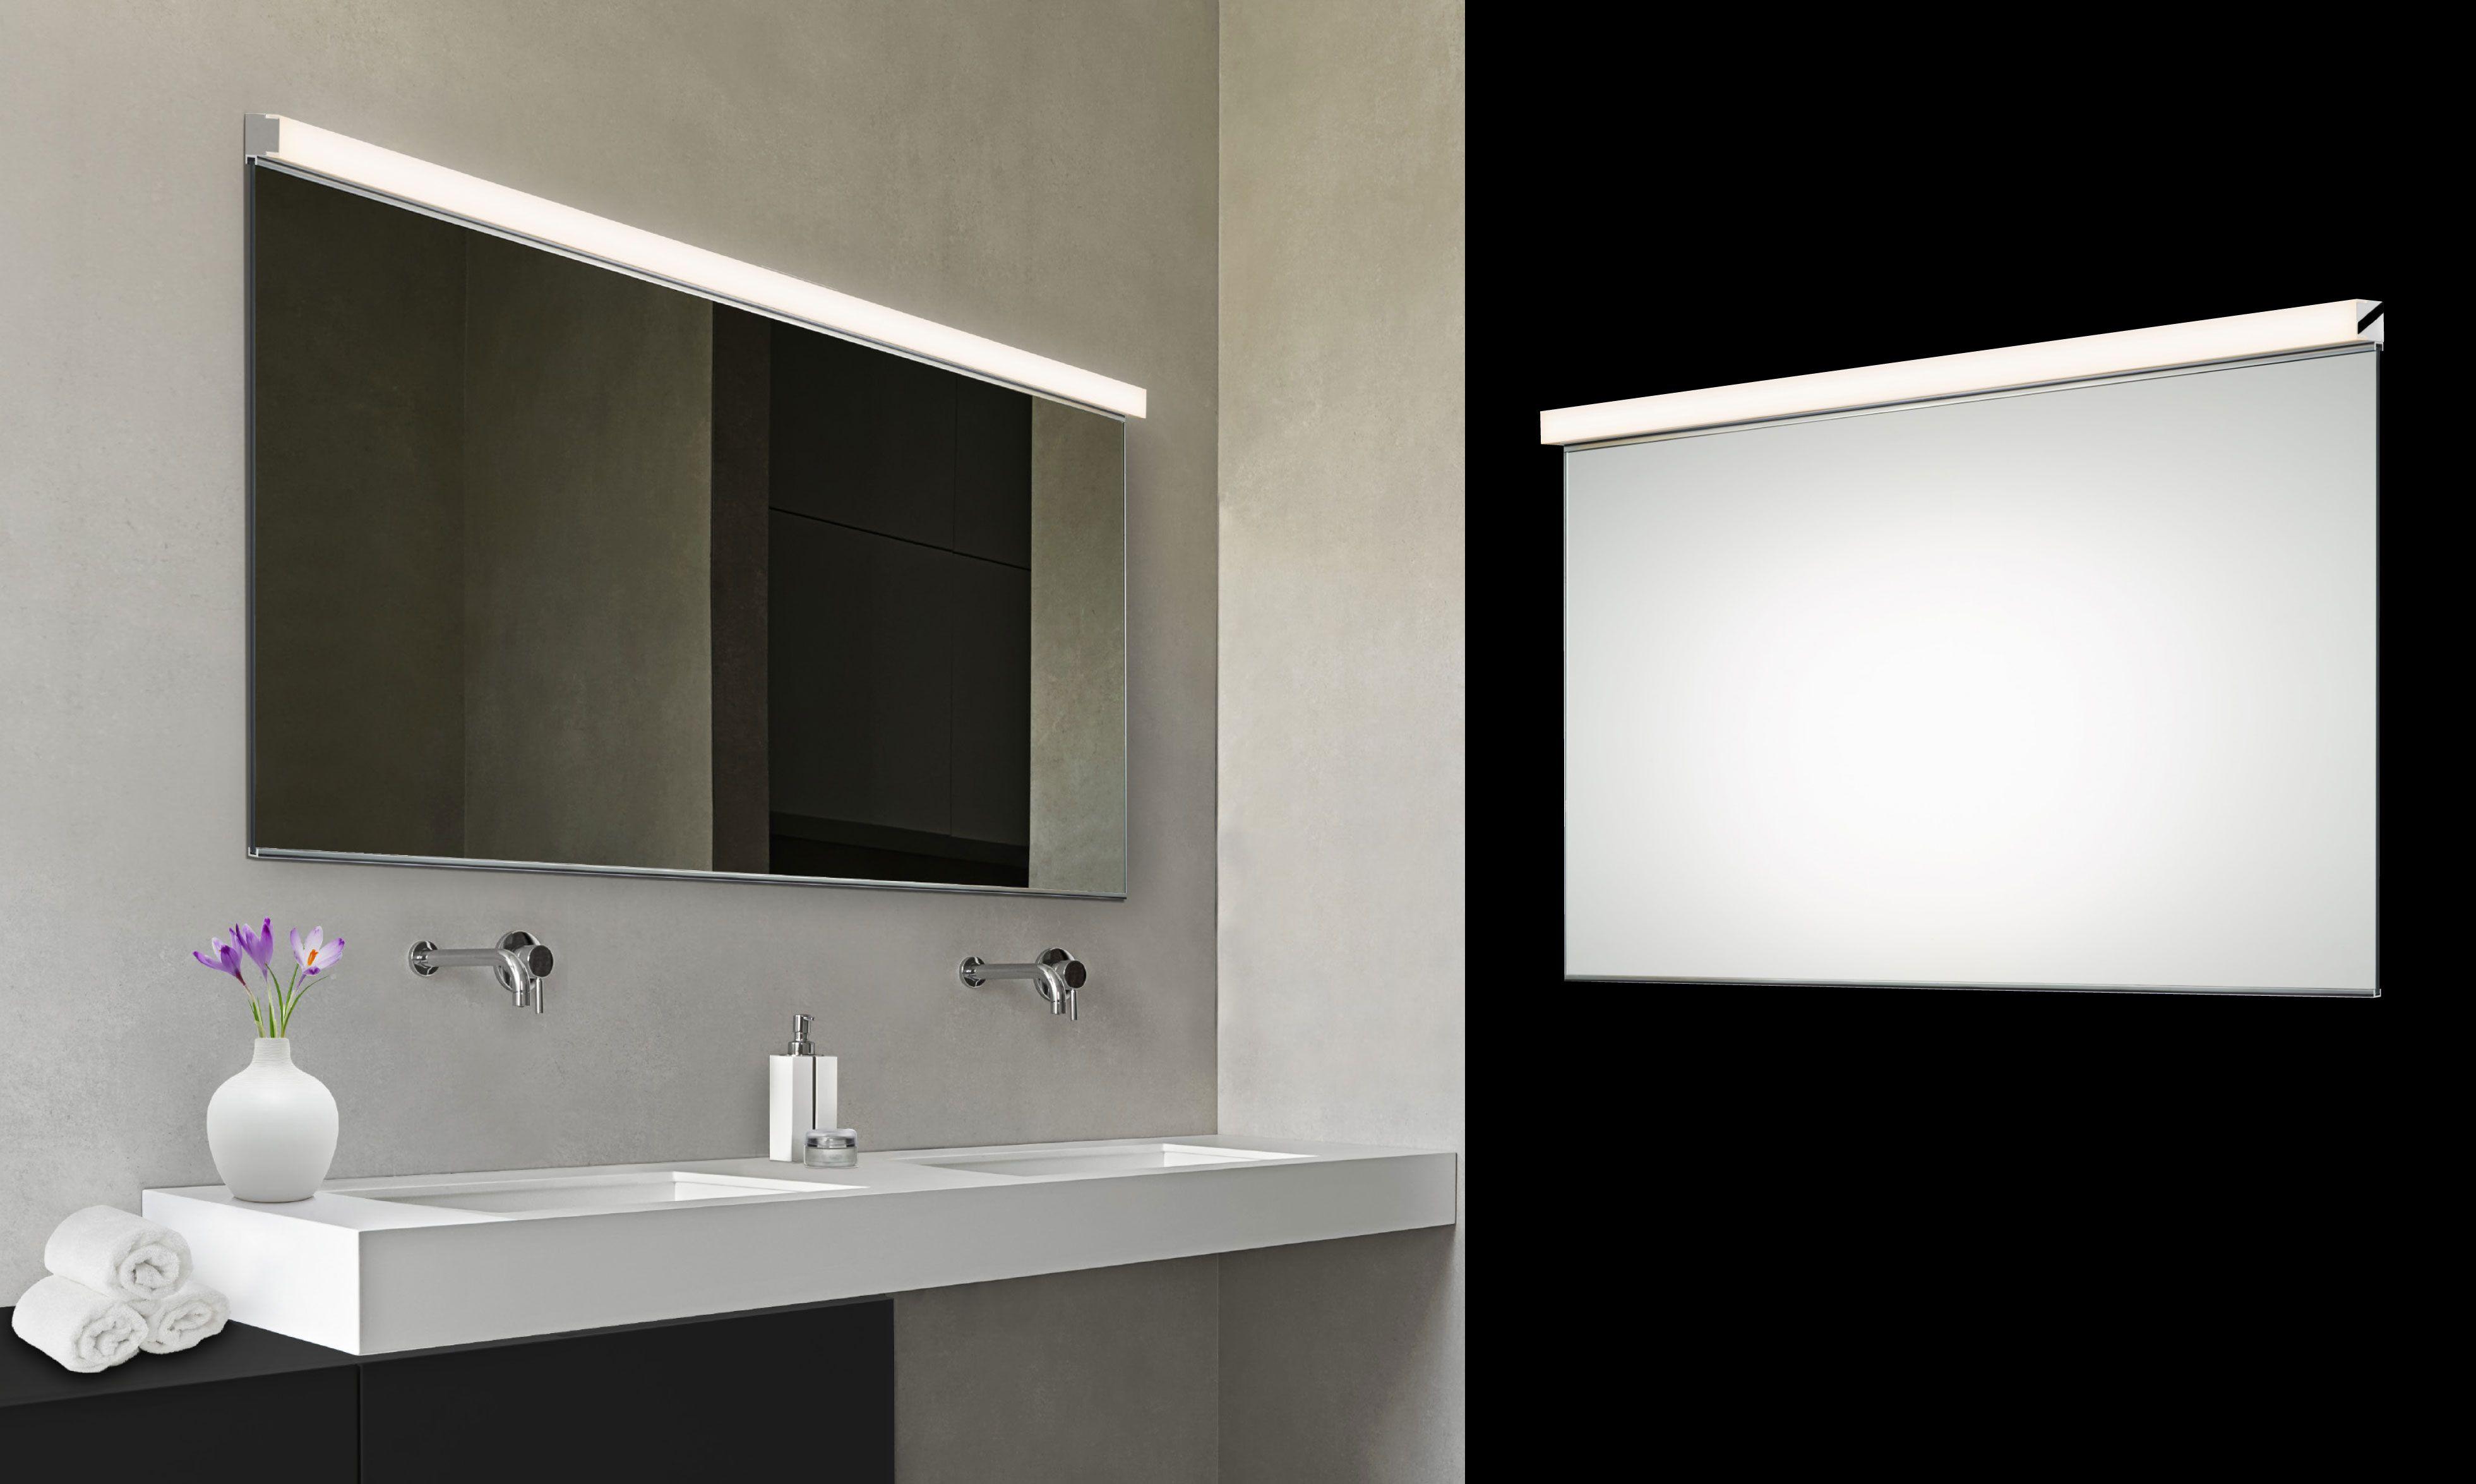 Vanity Slim Horizontal Led Mirror Kit 2552 01 Sonneman Lighting